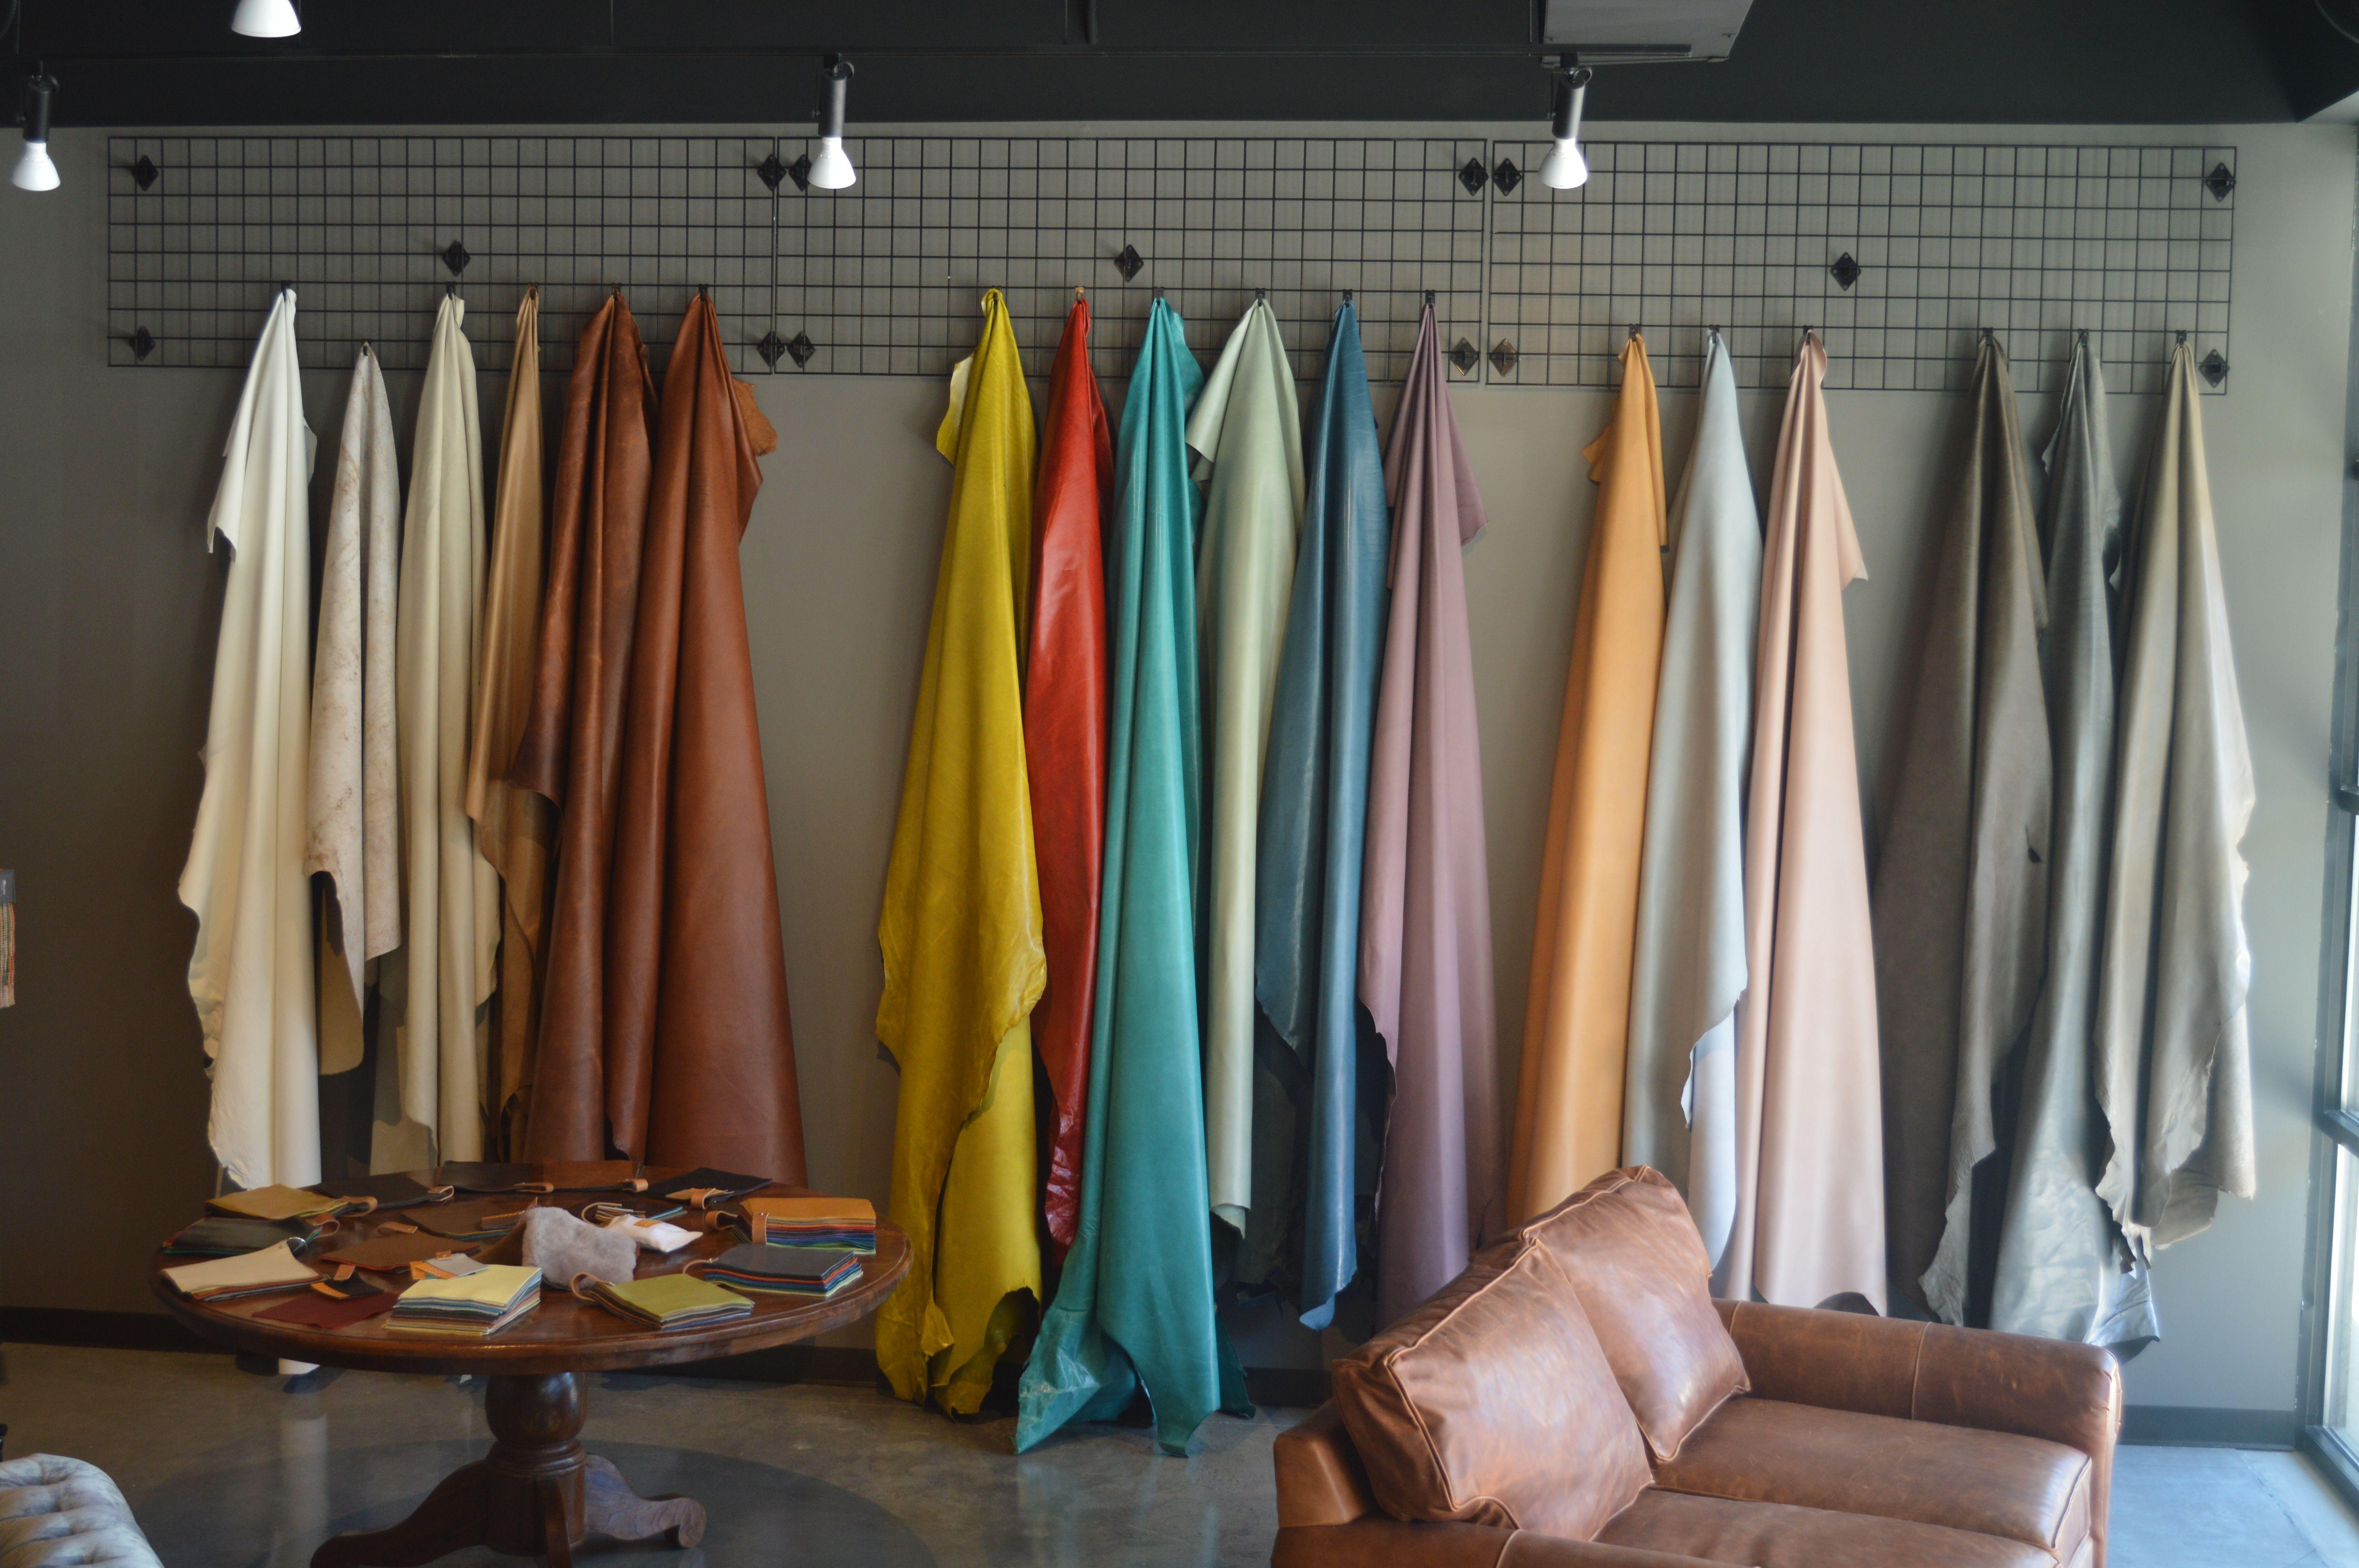 furniture cupboard warehouse stores atlanta ashley blvd ga outlets coaster near office jimmy carter